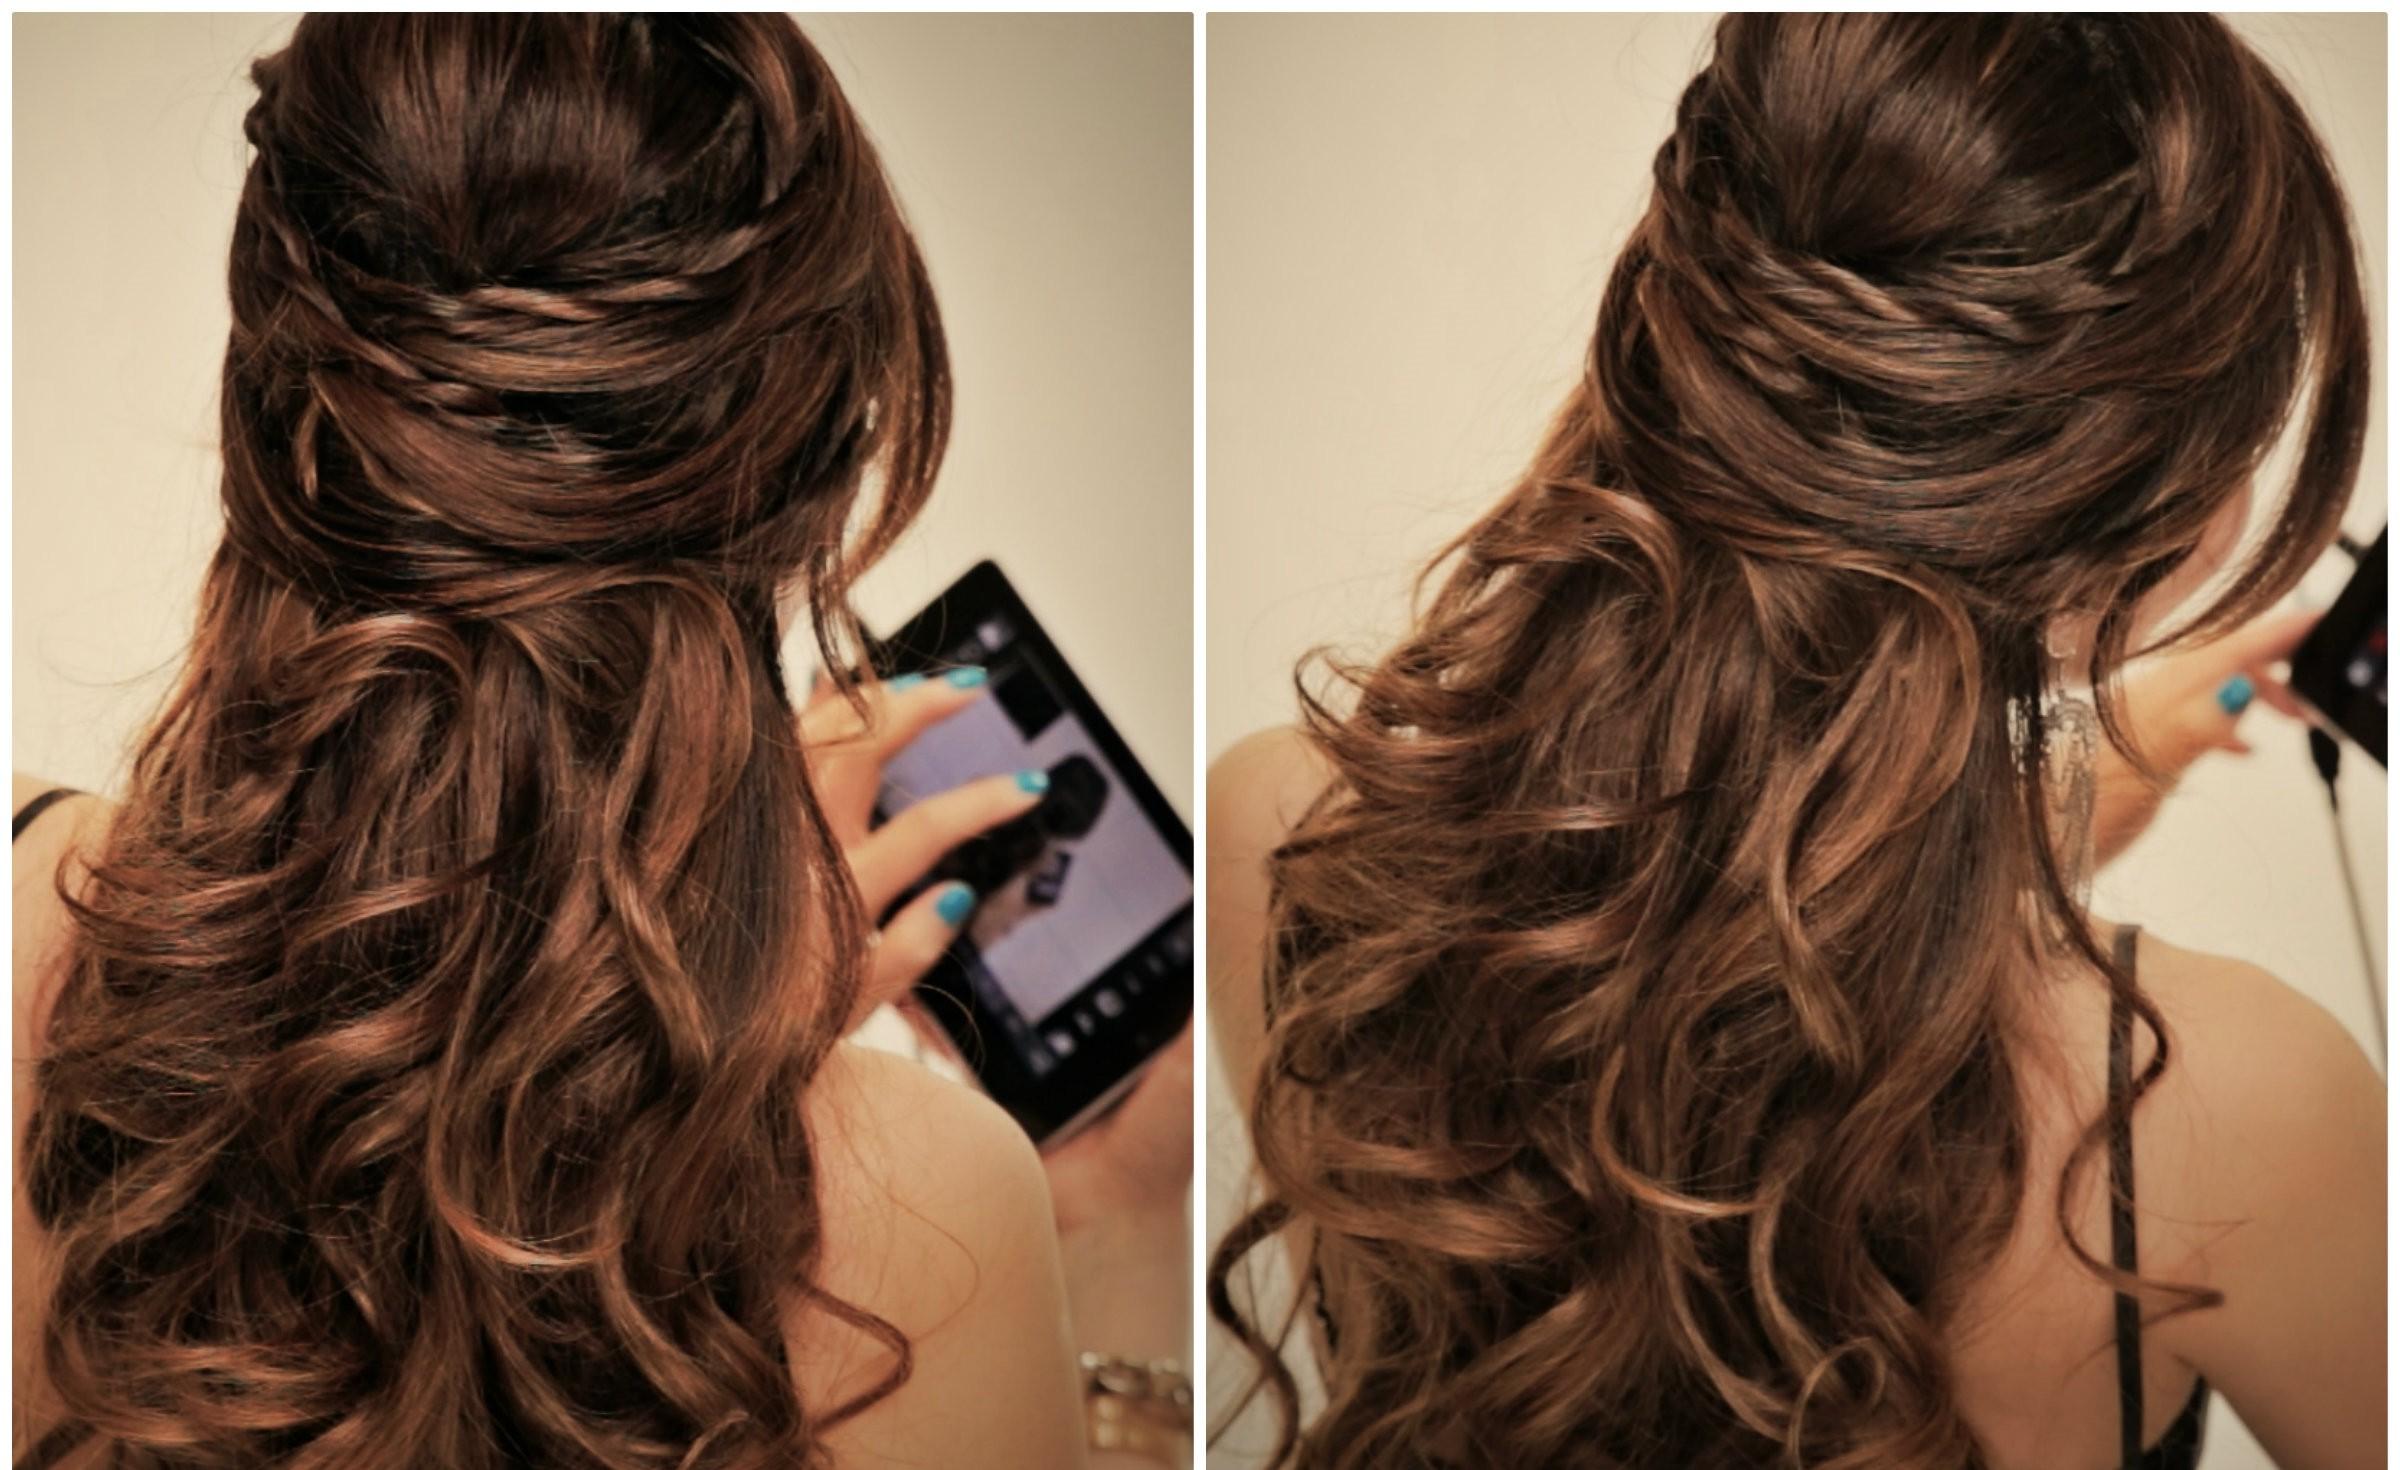 Sophie Hairstyles – 8183 Pertaining To Popular Sleek And Simple Wedding Hairstyles (Gallery 18 of 20)